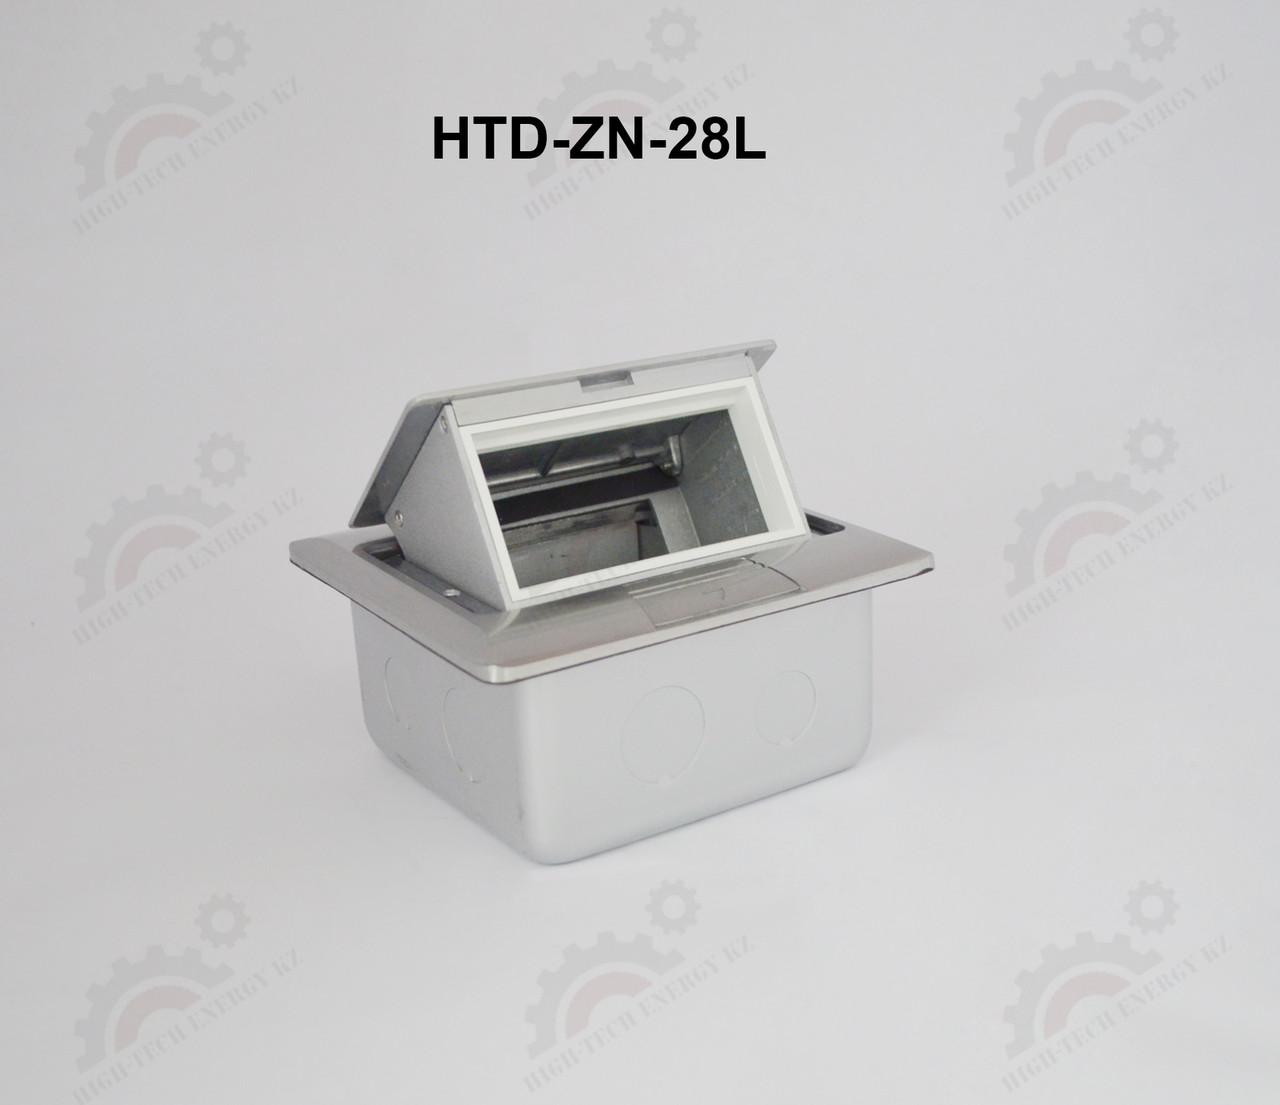 FEILIFU HTD-ZN-28L Напольный лючок на 4 модуля, металл, цвет серебро